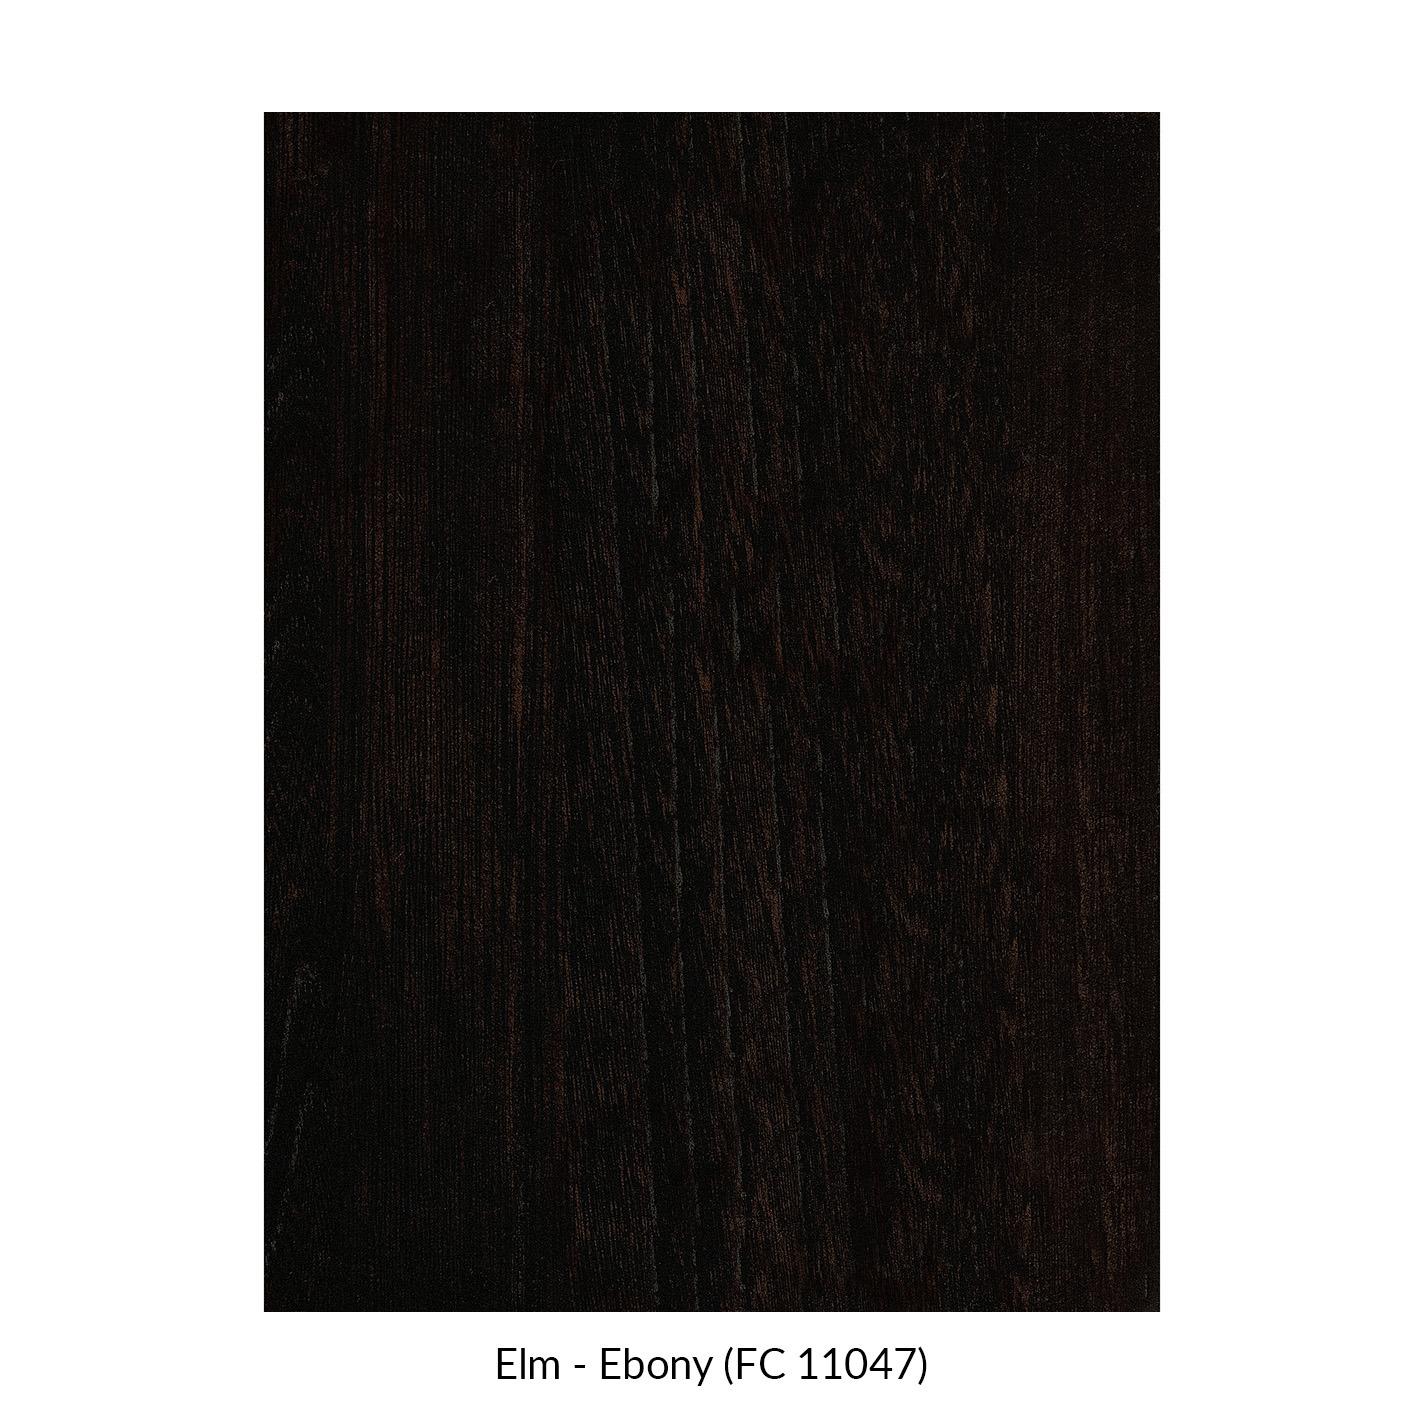 spectrum-elm-ebony-fc-11047.jpg